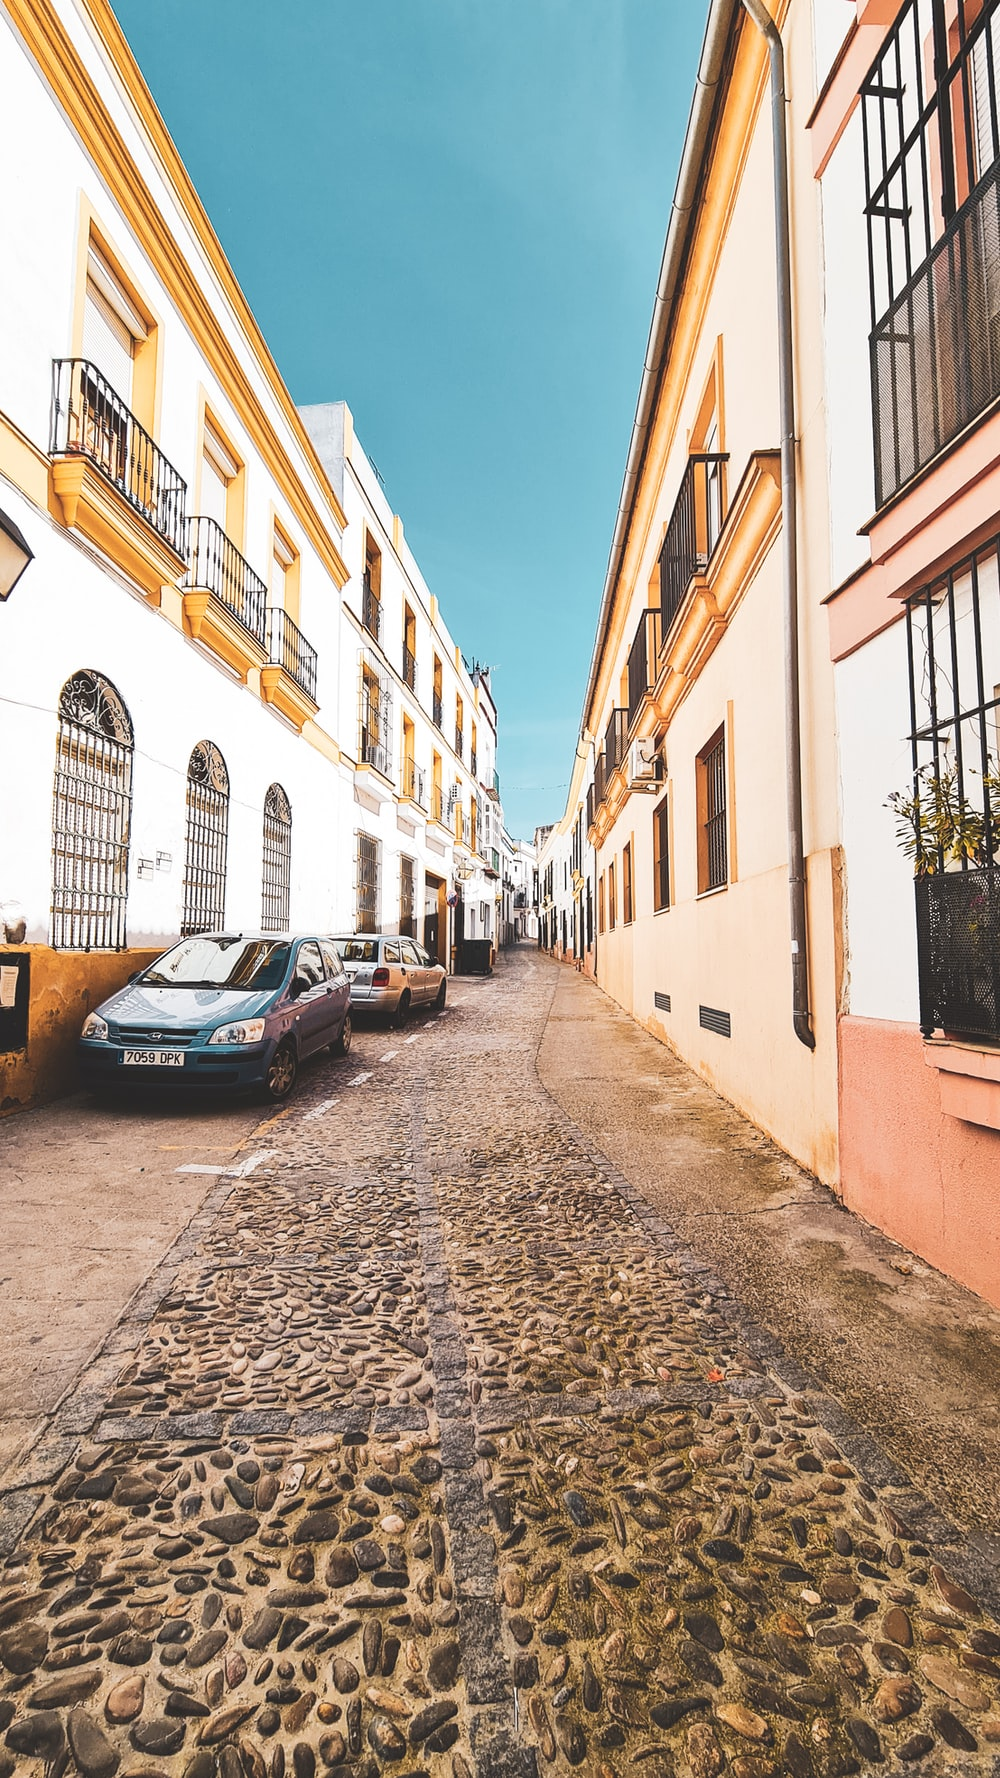 blue car parked beside beige concrete building during daytime